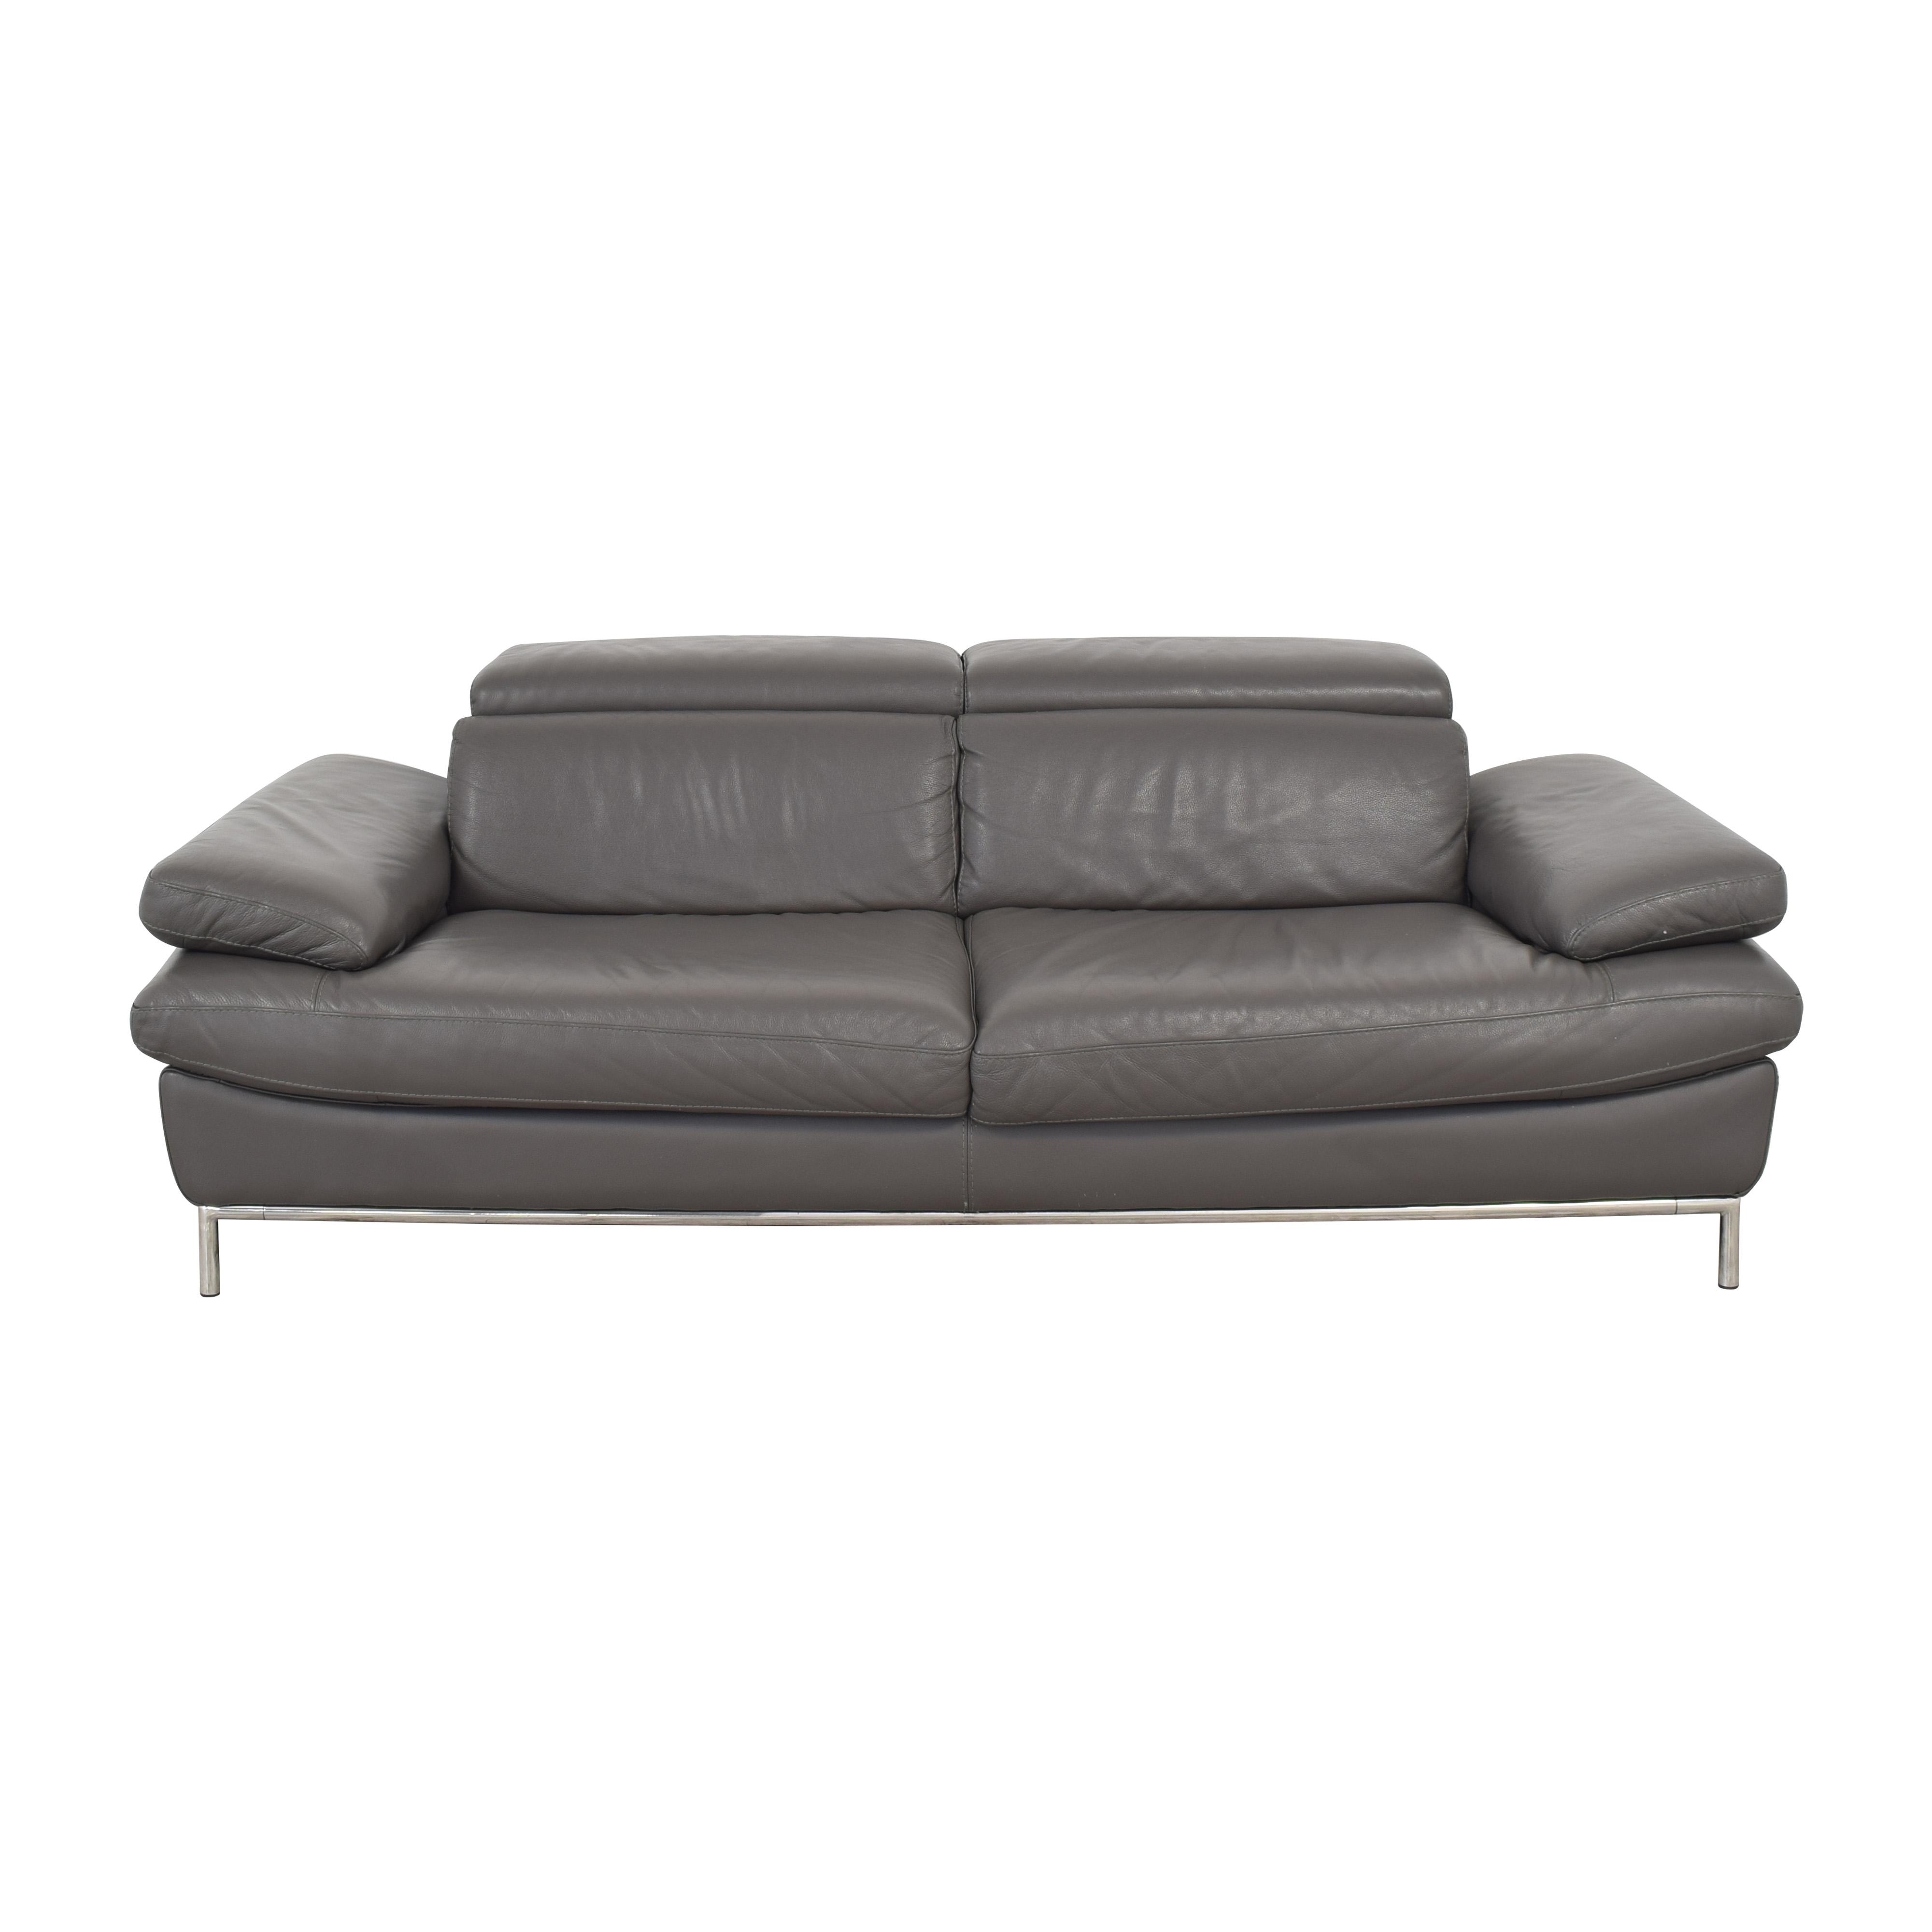 Italian Three Seat Sofa for sale